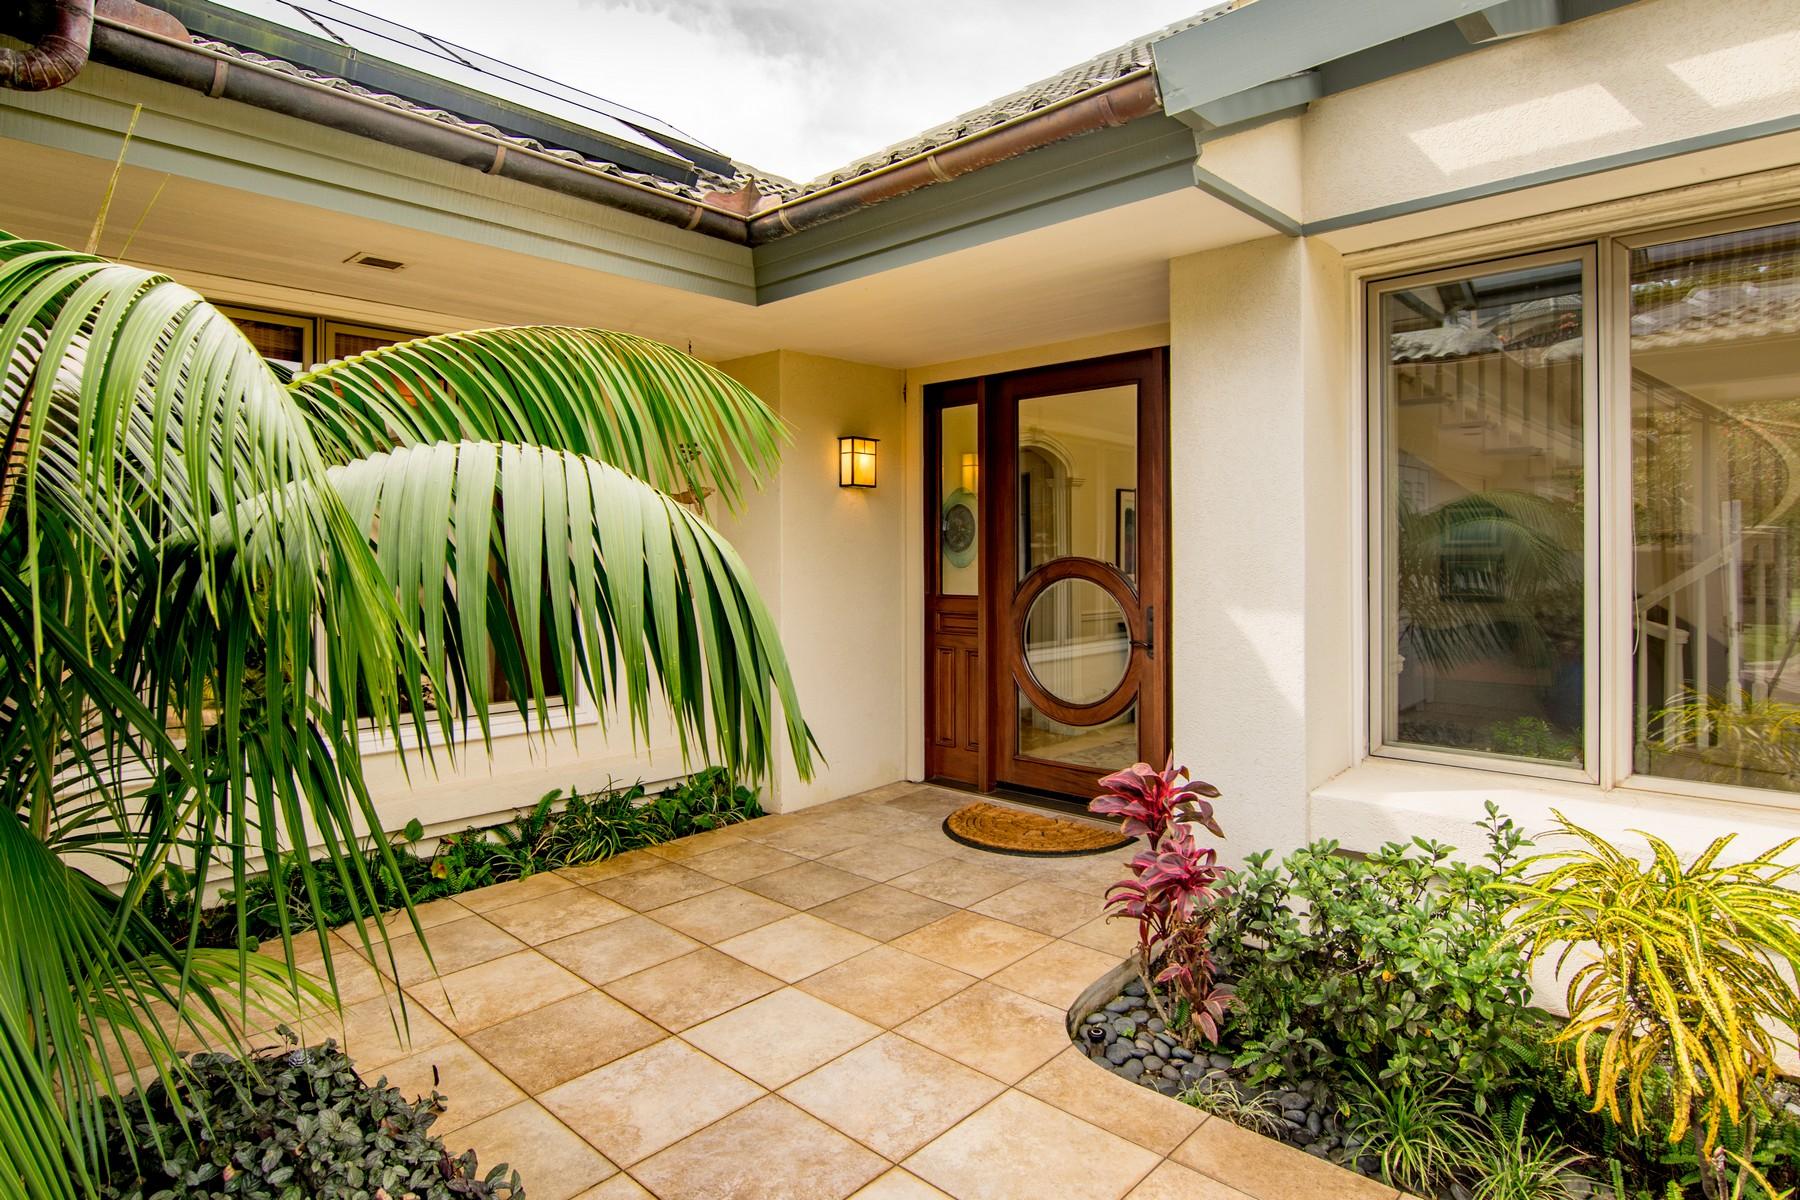 Single Family Home for Sale at Kapalua Pineapple Hill Masterpiece!! 600 Silversword Drive Kapalua, Hawaii, 96761 United States